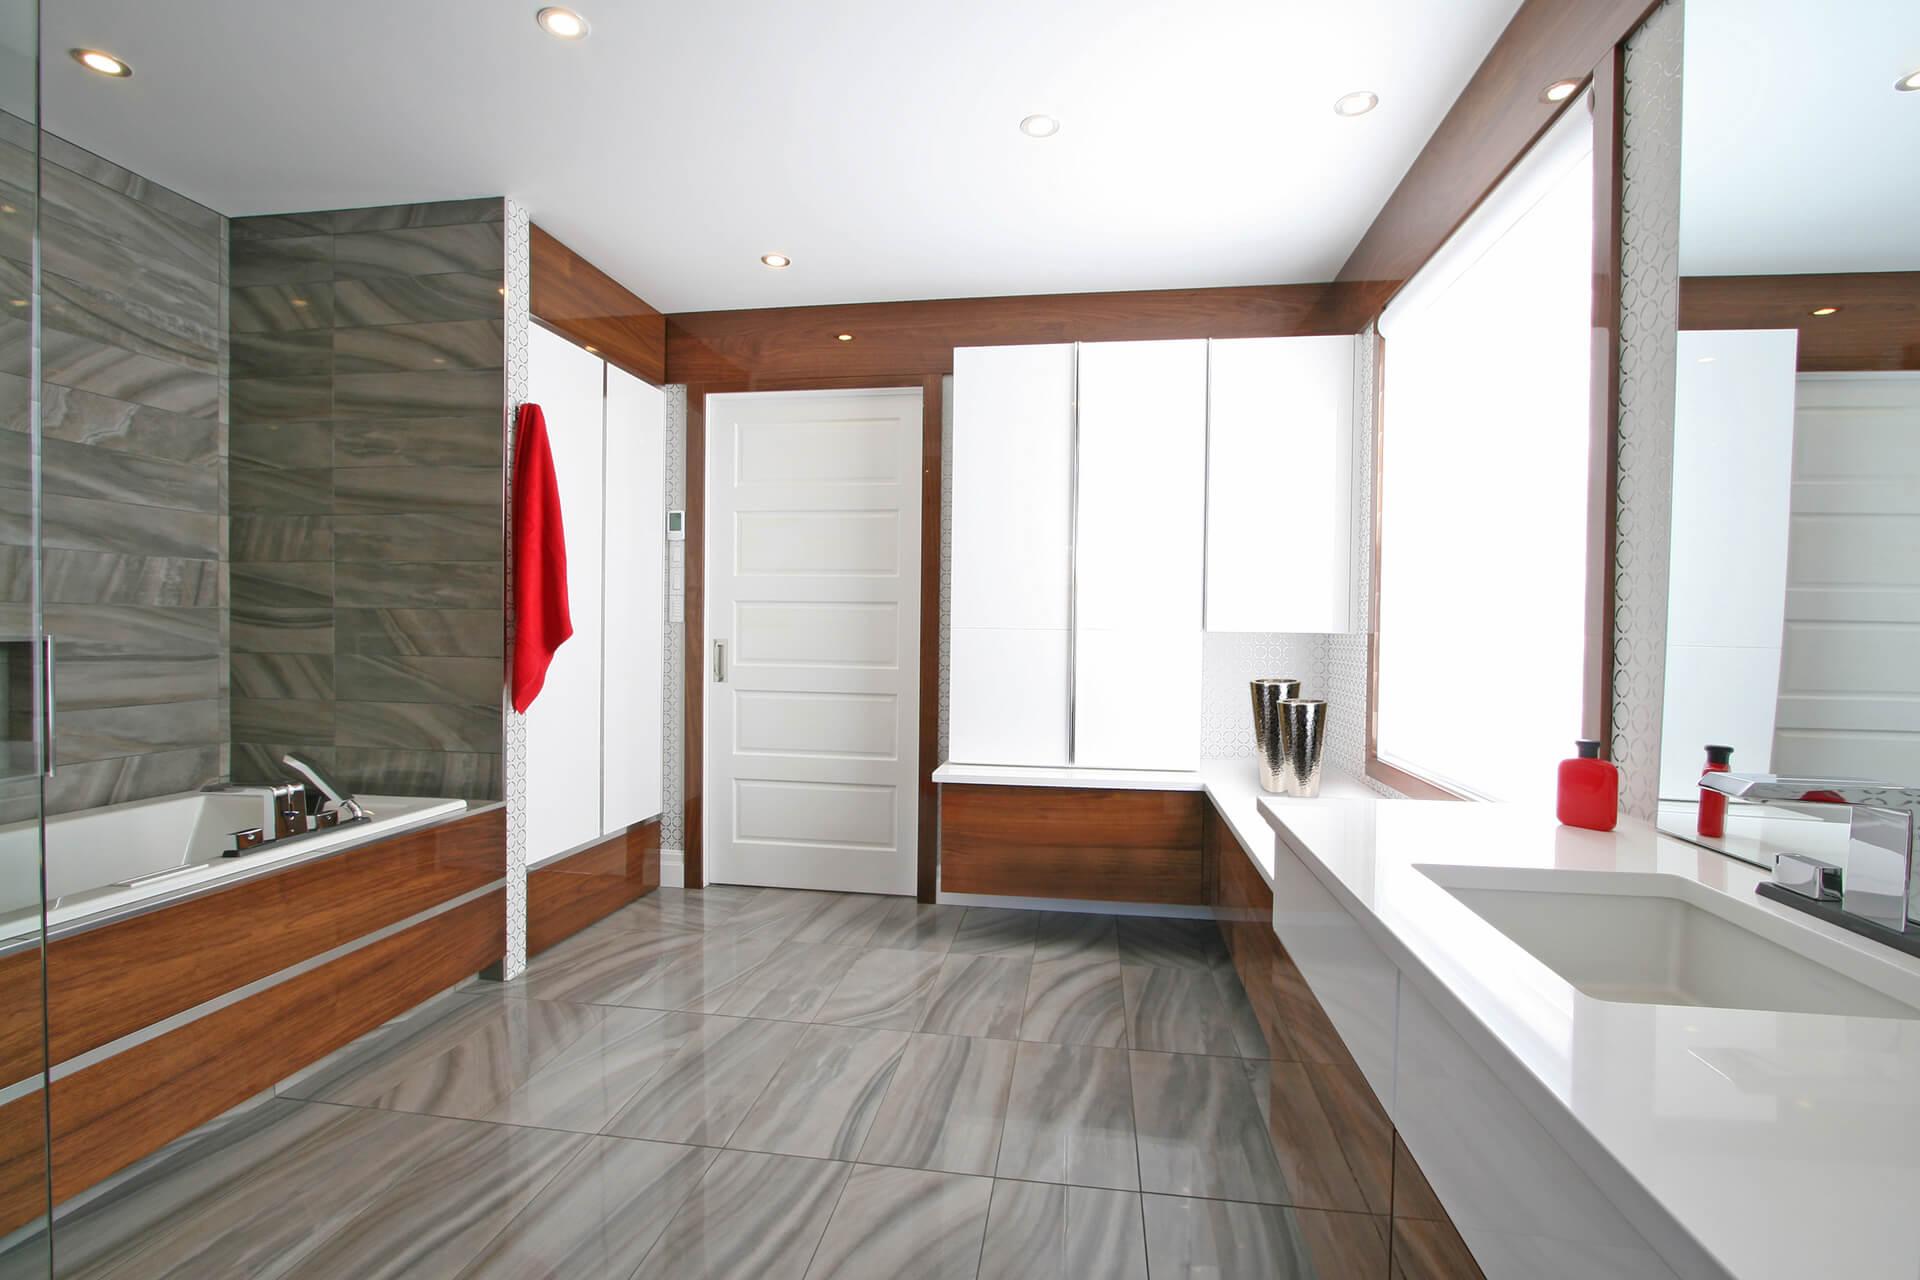 photos de salle de bain moderne pinterest salles de bains modernes style boudoir with photos de. Black Bedroom Furniture Sets. Home Design Ideas